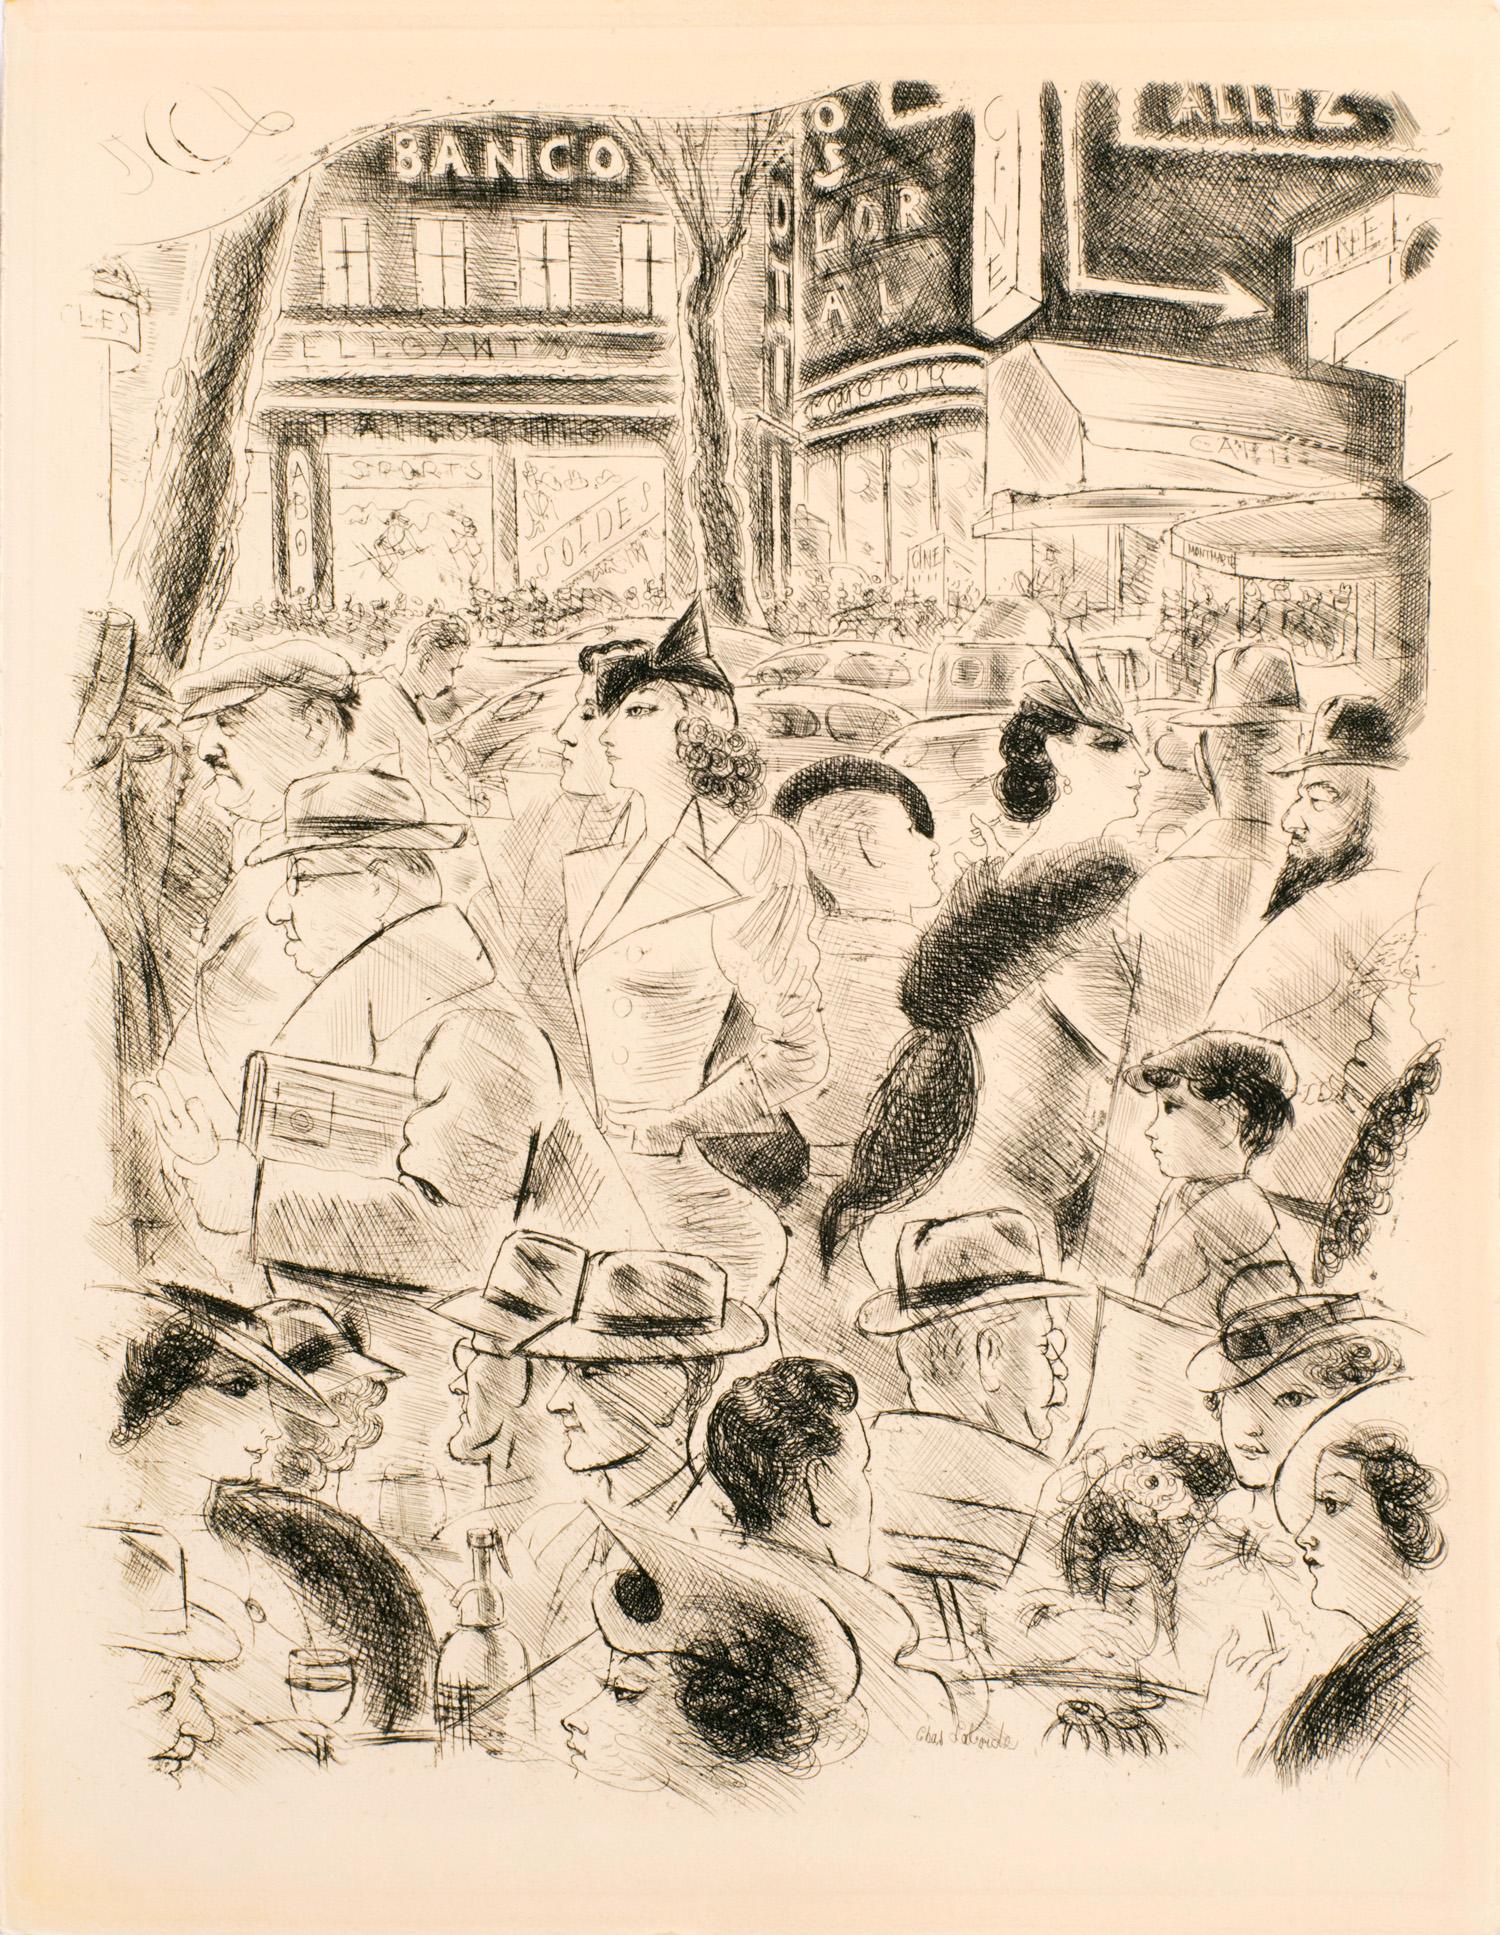 Grands Boulevards | Grands Boulevards | Paris 1937